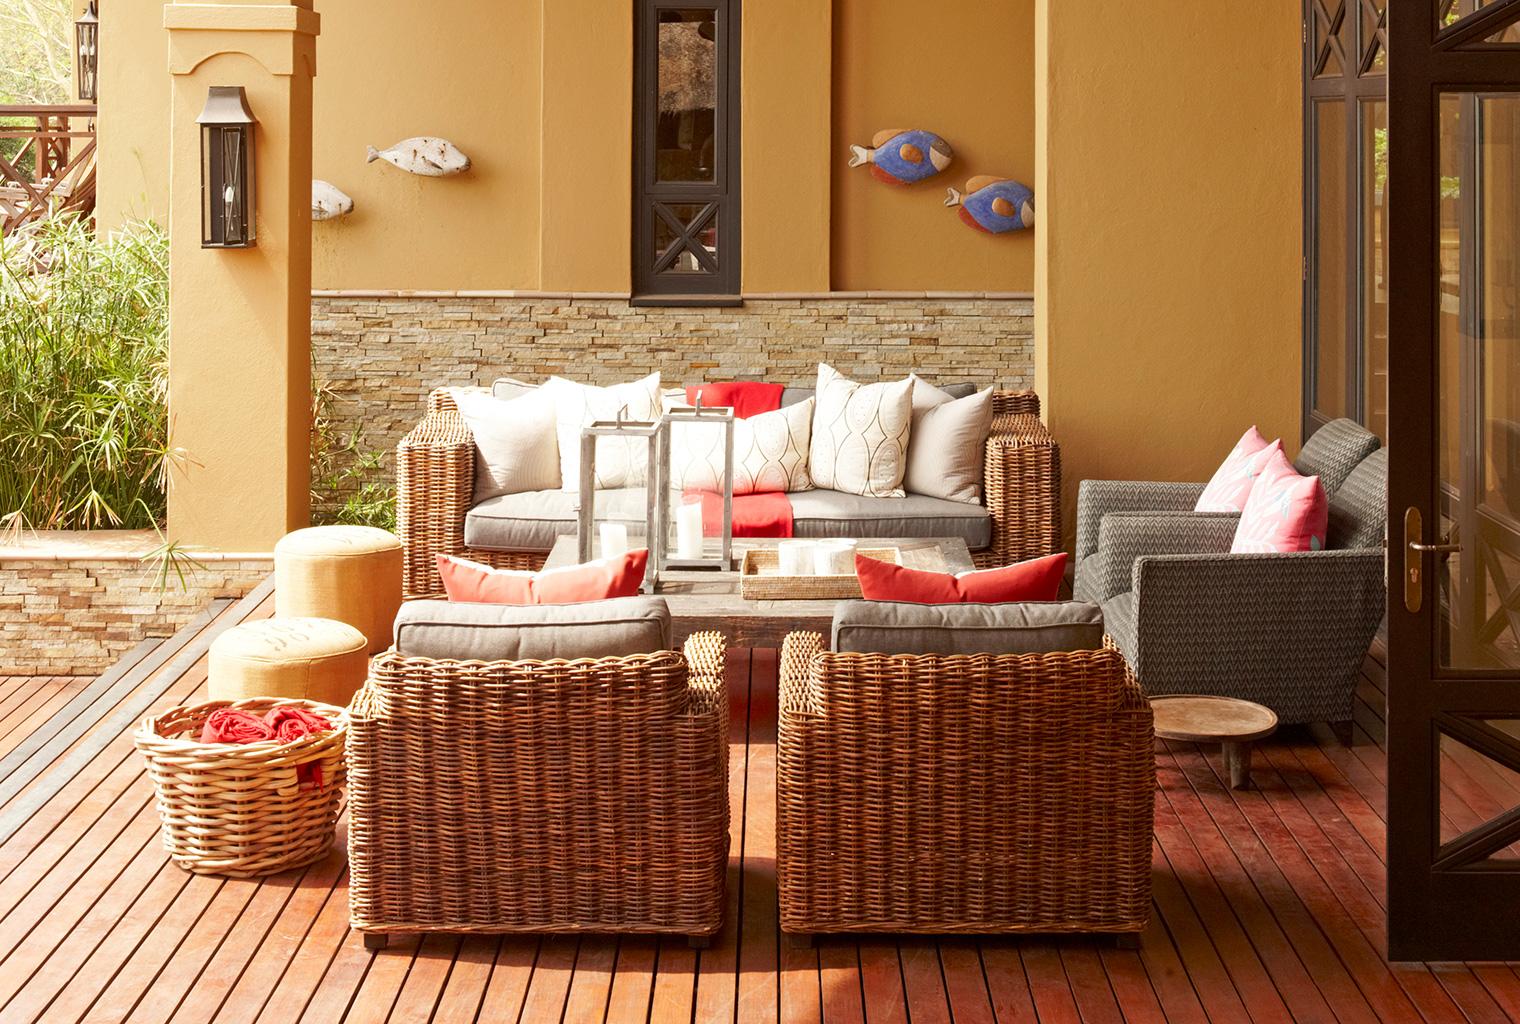 Thanda-Villa-Izulu-South-Africa-Veranda